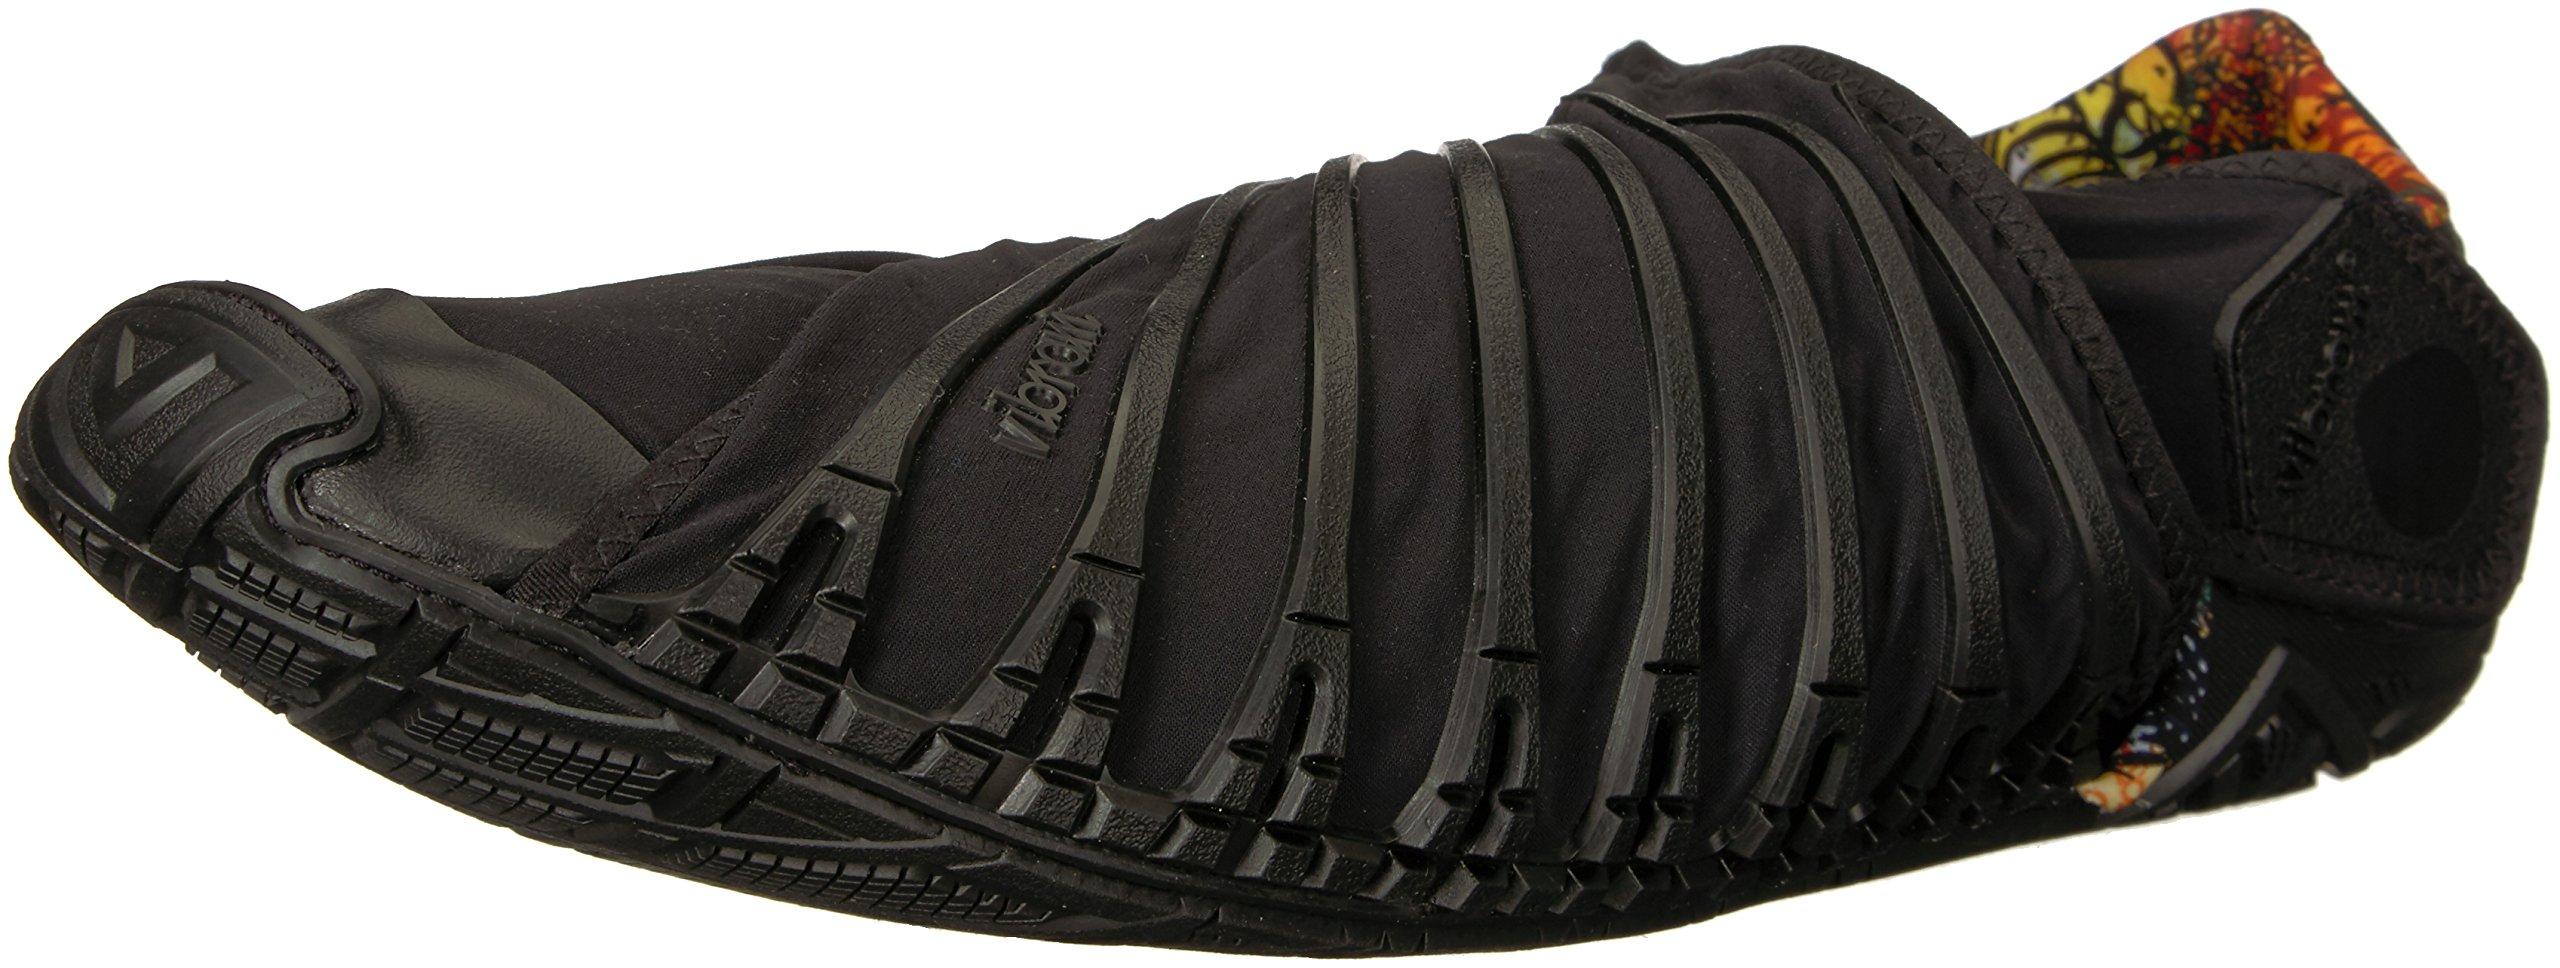 Vibram Furoshiki Black Sneaker 9 0 9 5